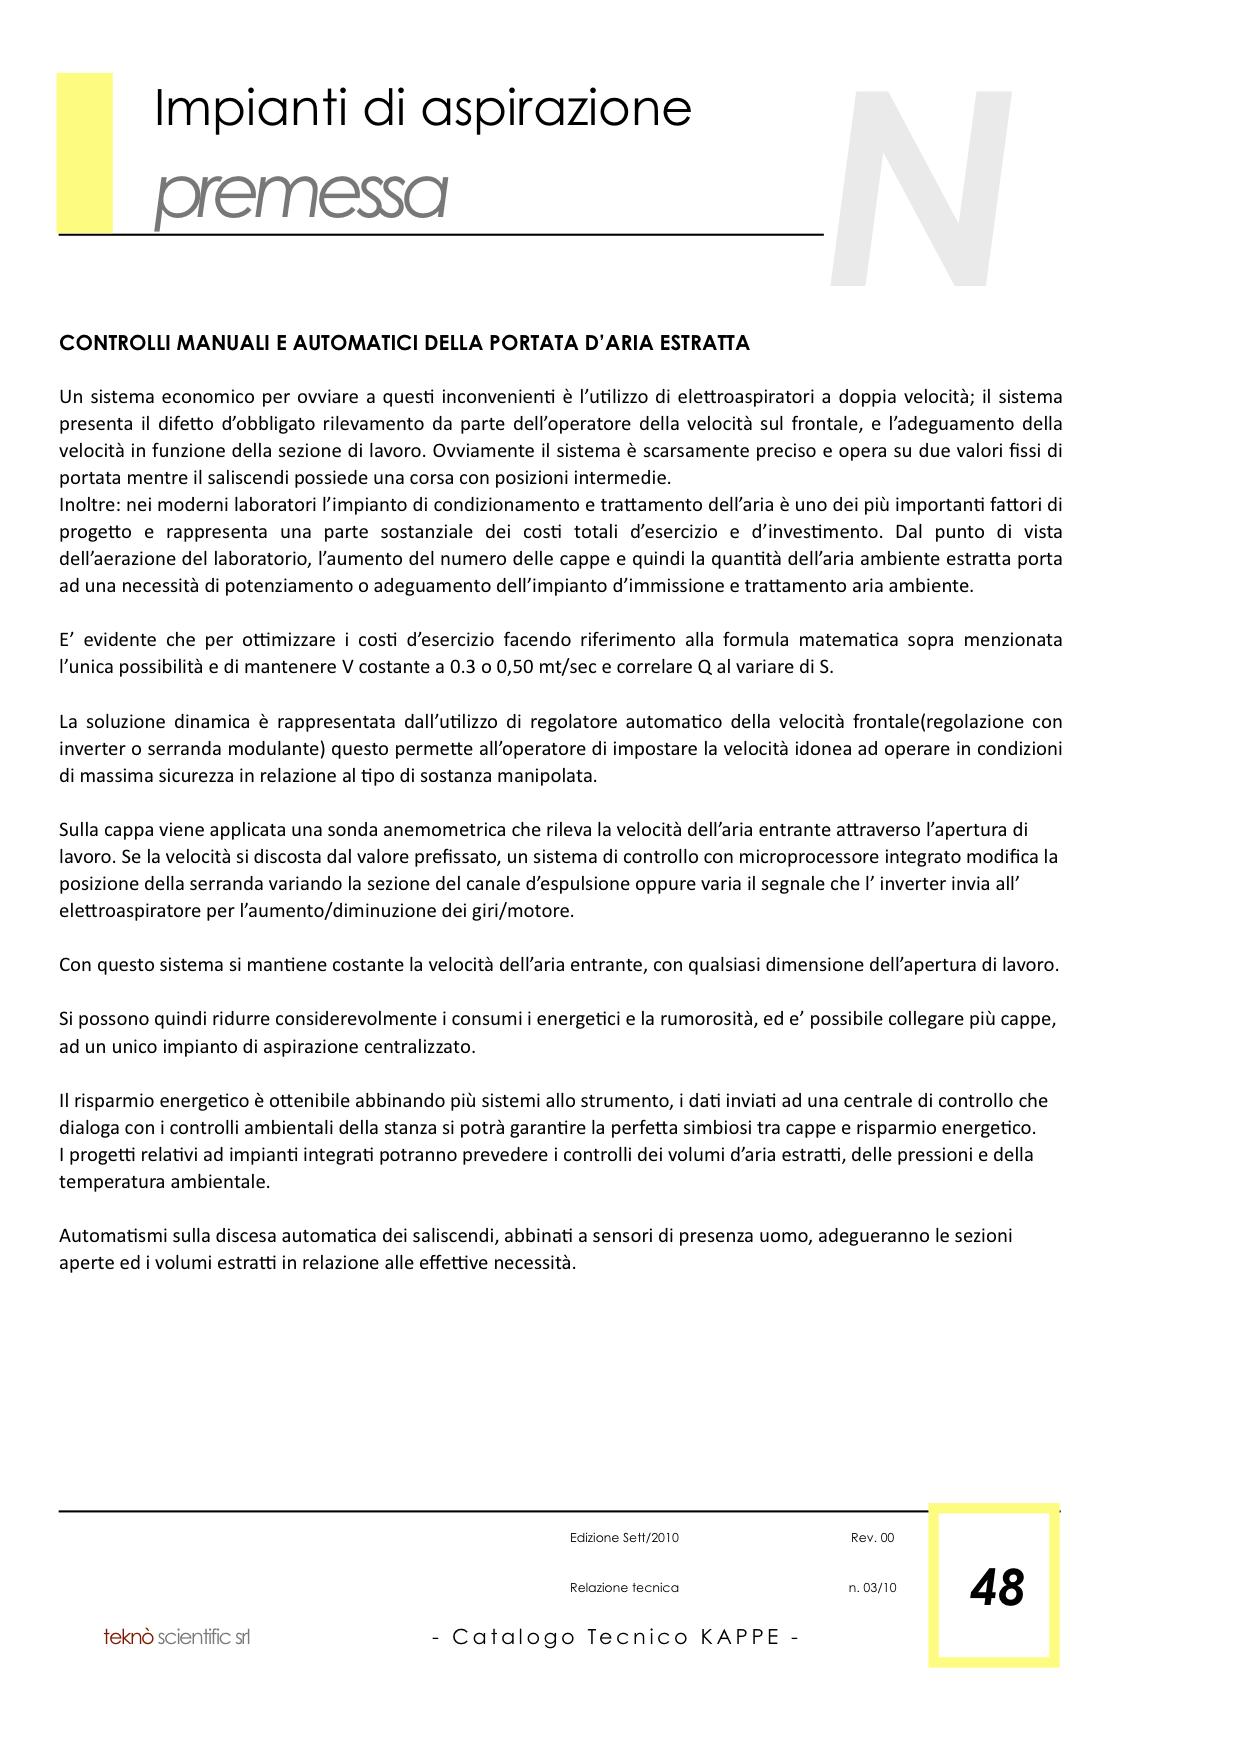 KAPPE Catalogo Tecnico Generale copia 18.png